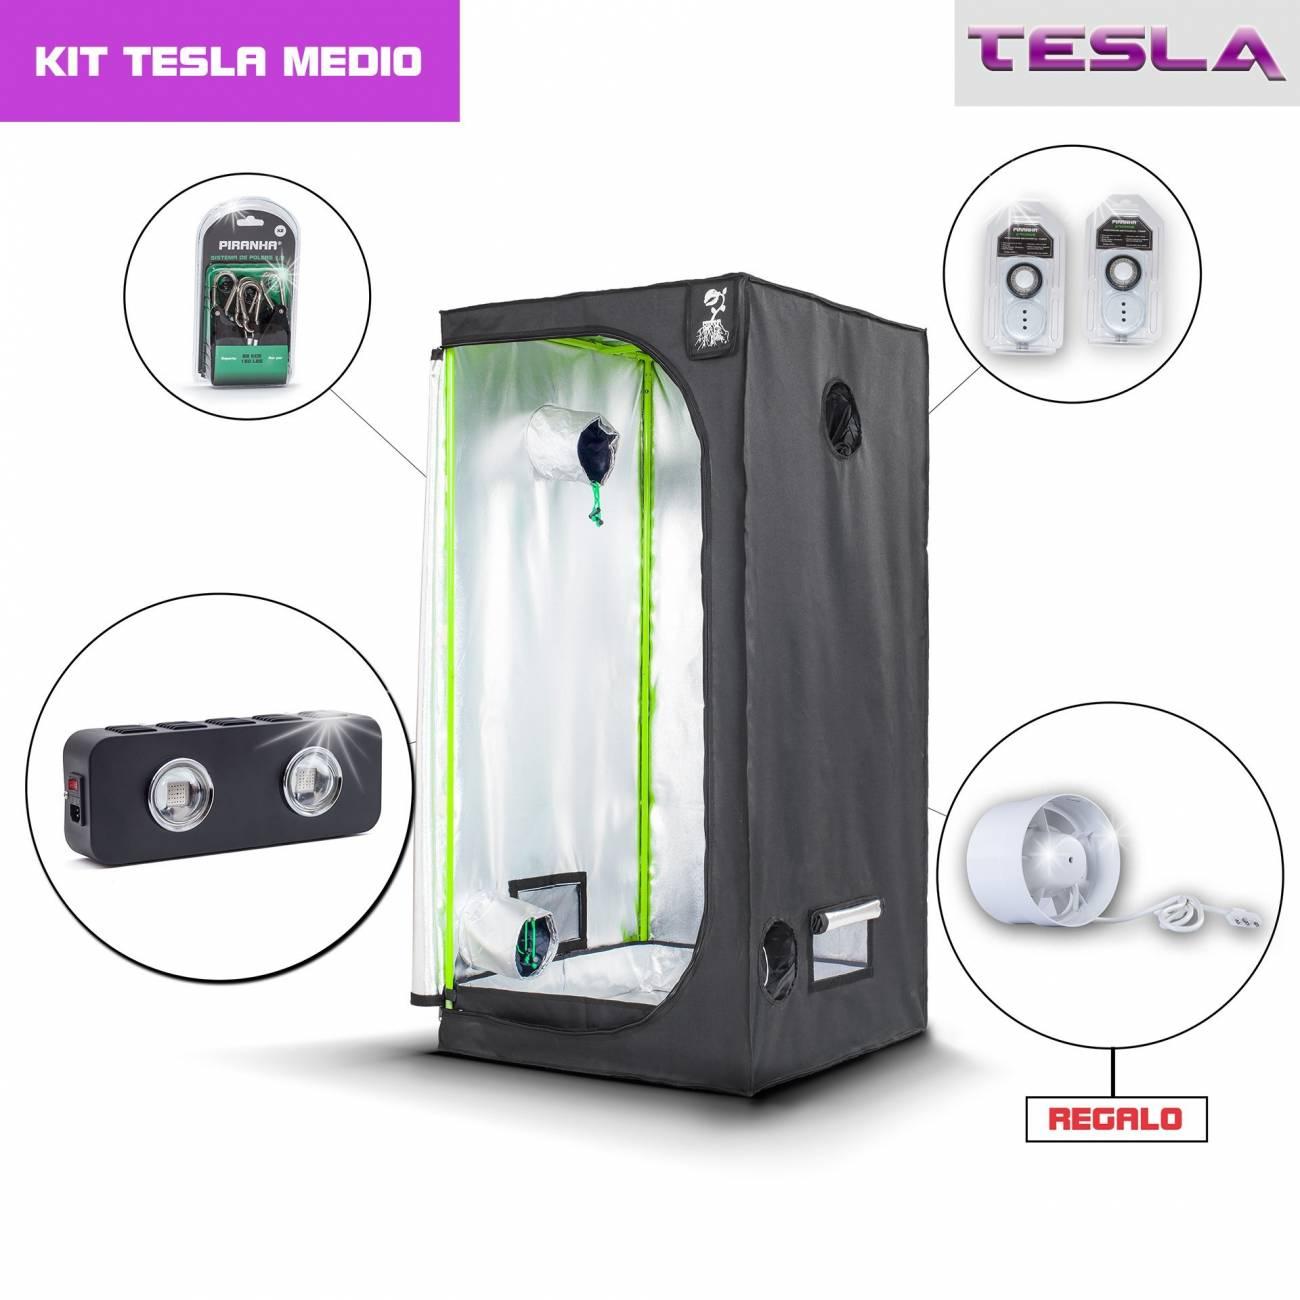 Kit Tesla 80 - T180W Medio